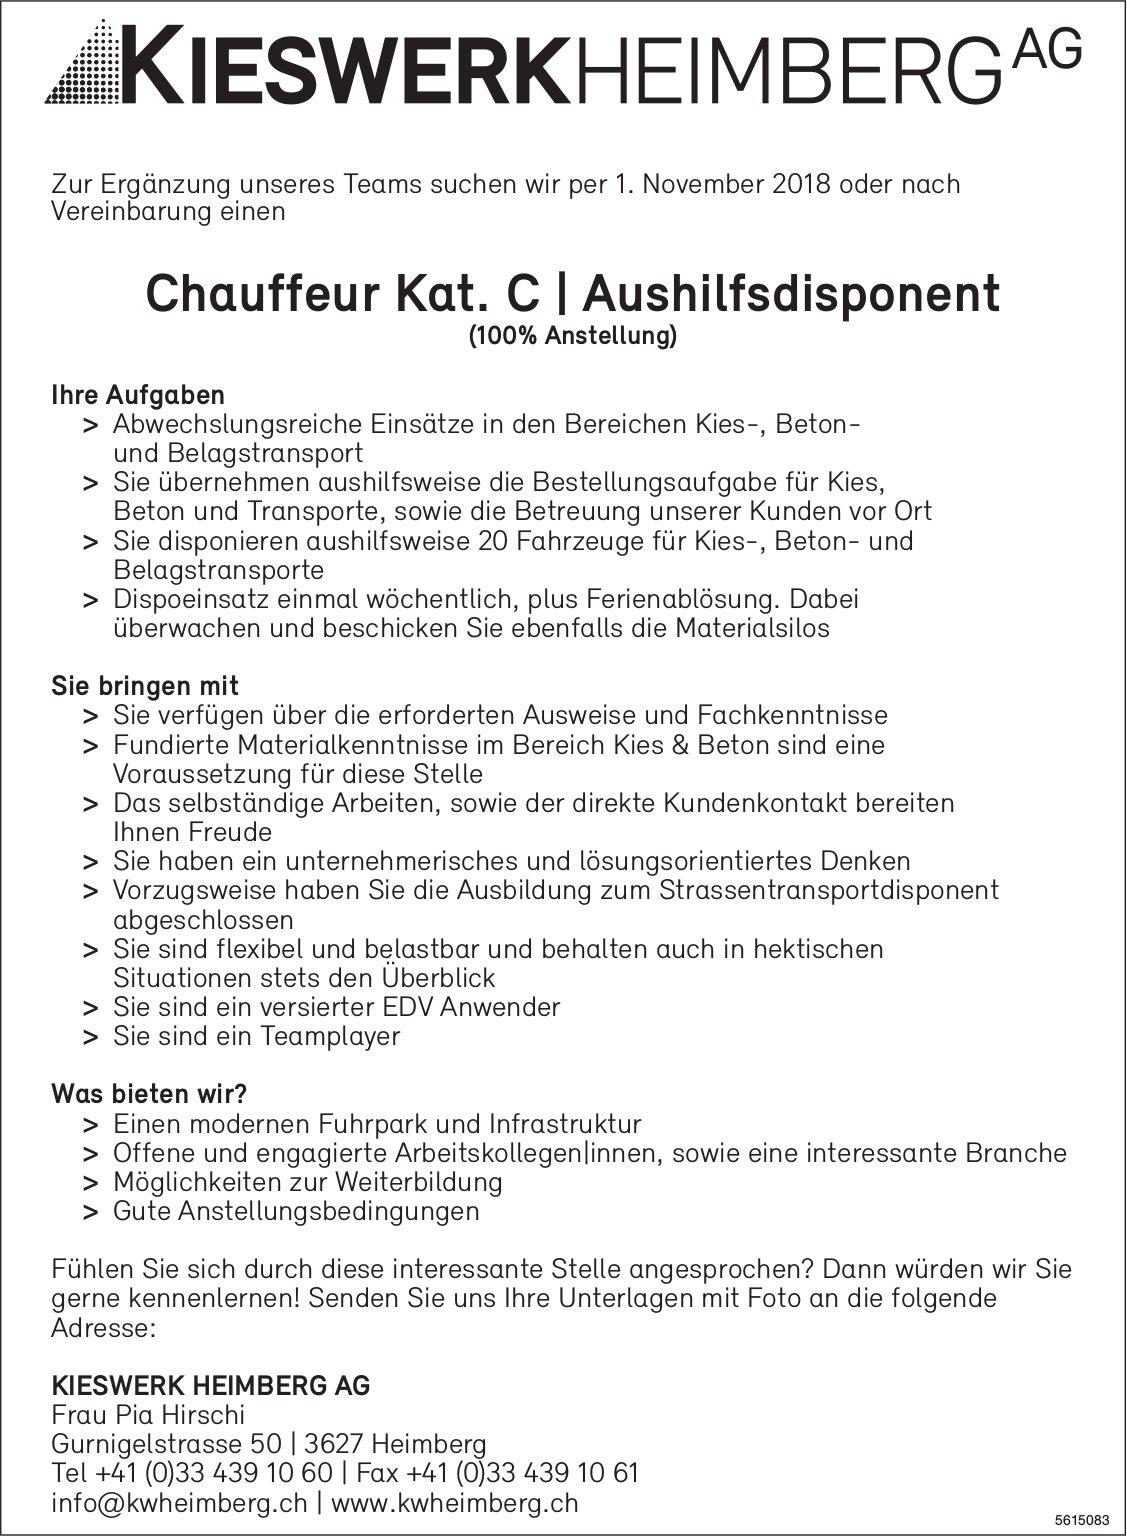 Chauffeur Kat. C/ Aushilfsdisponent bei KIESWERK HEIMBERG AG gesucht